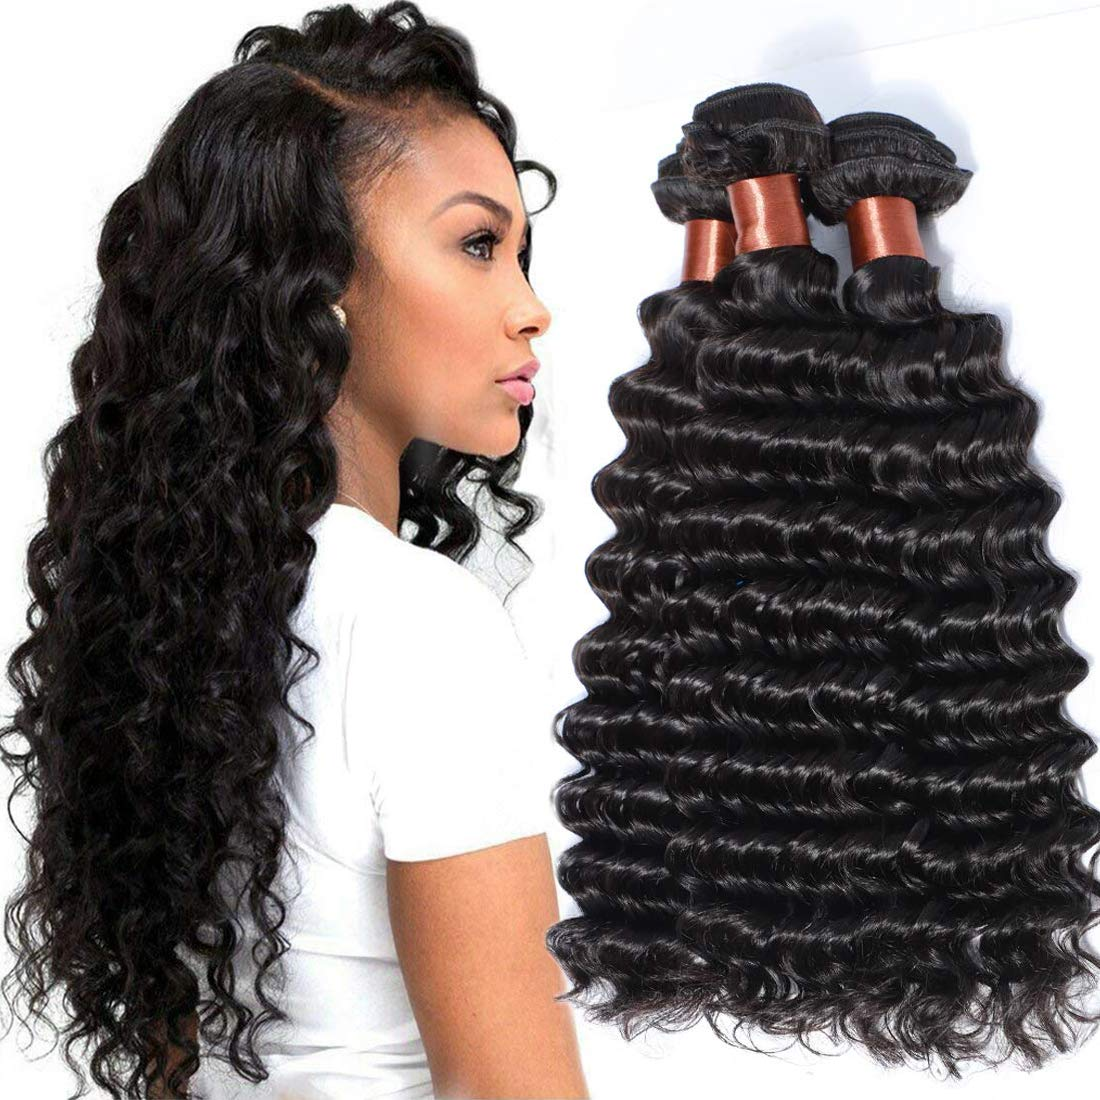 OFFicial store BLACKMOON HAIR Brazilian Virgin Hair Deep Bundles 3 Wave Omaha Mall